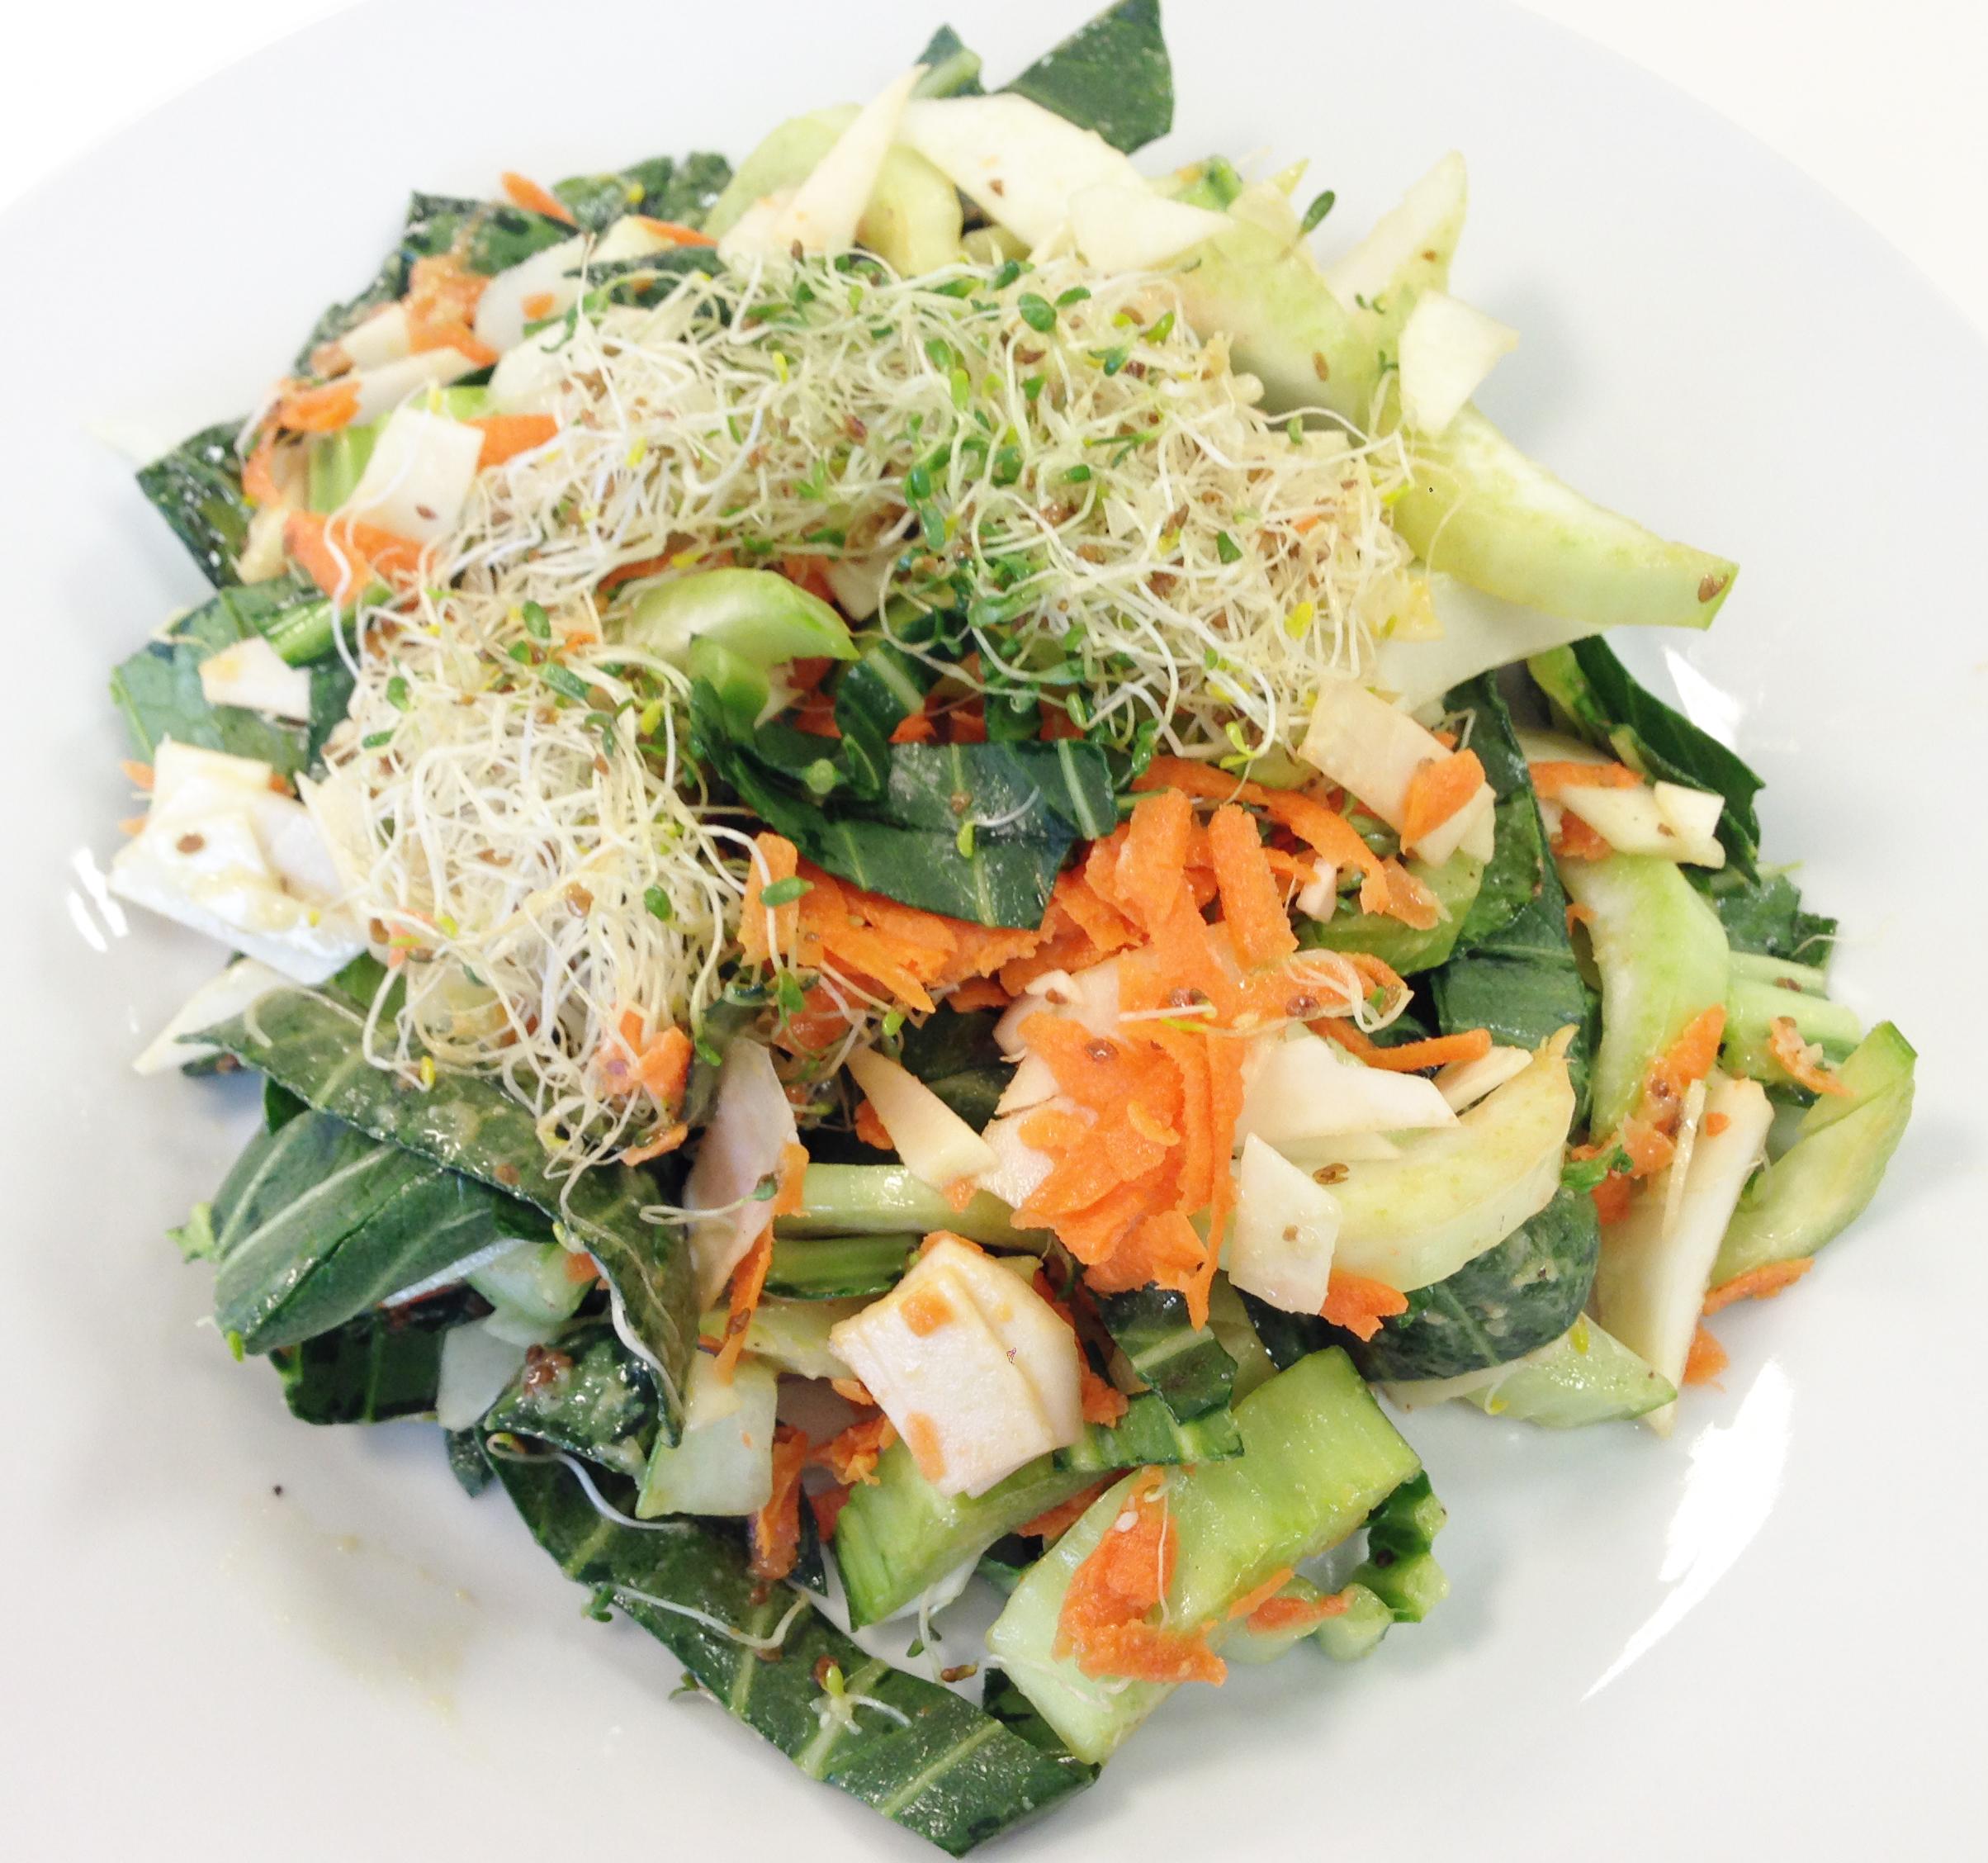 Chilled Tofu Salad With Miso-Ginger Vinaigrette Recipes — Dishmaps